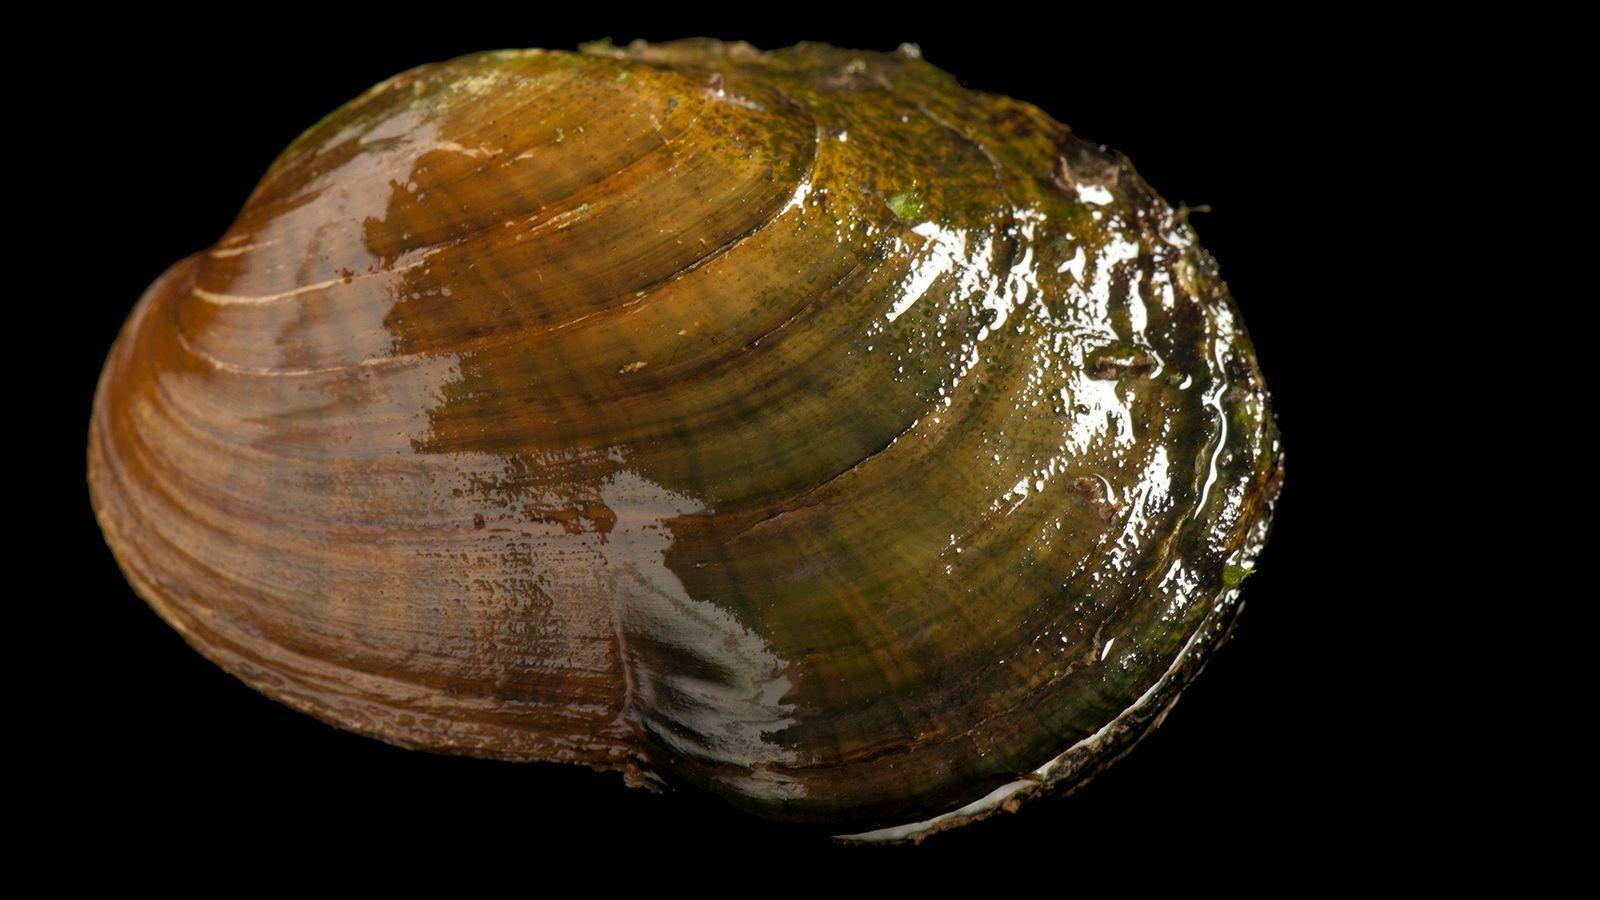 Epioblasma capsaeformis